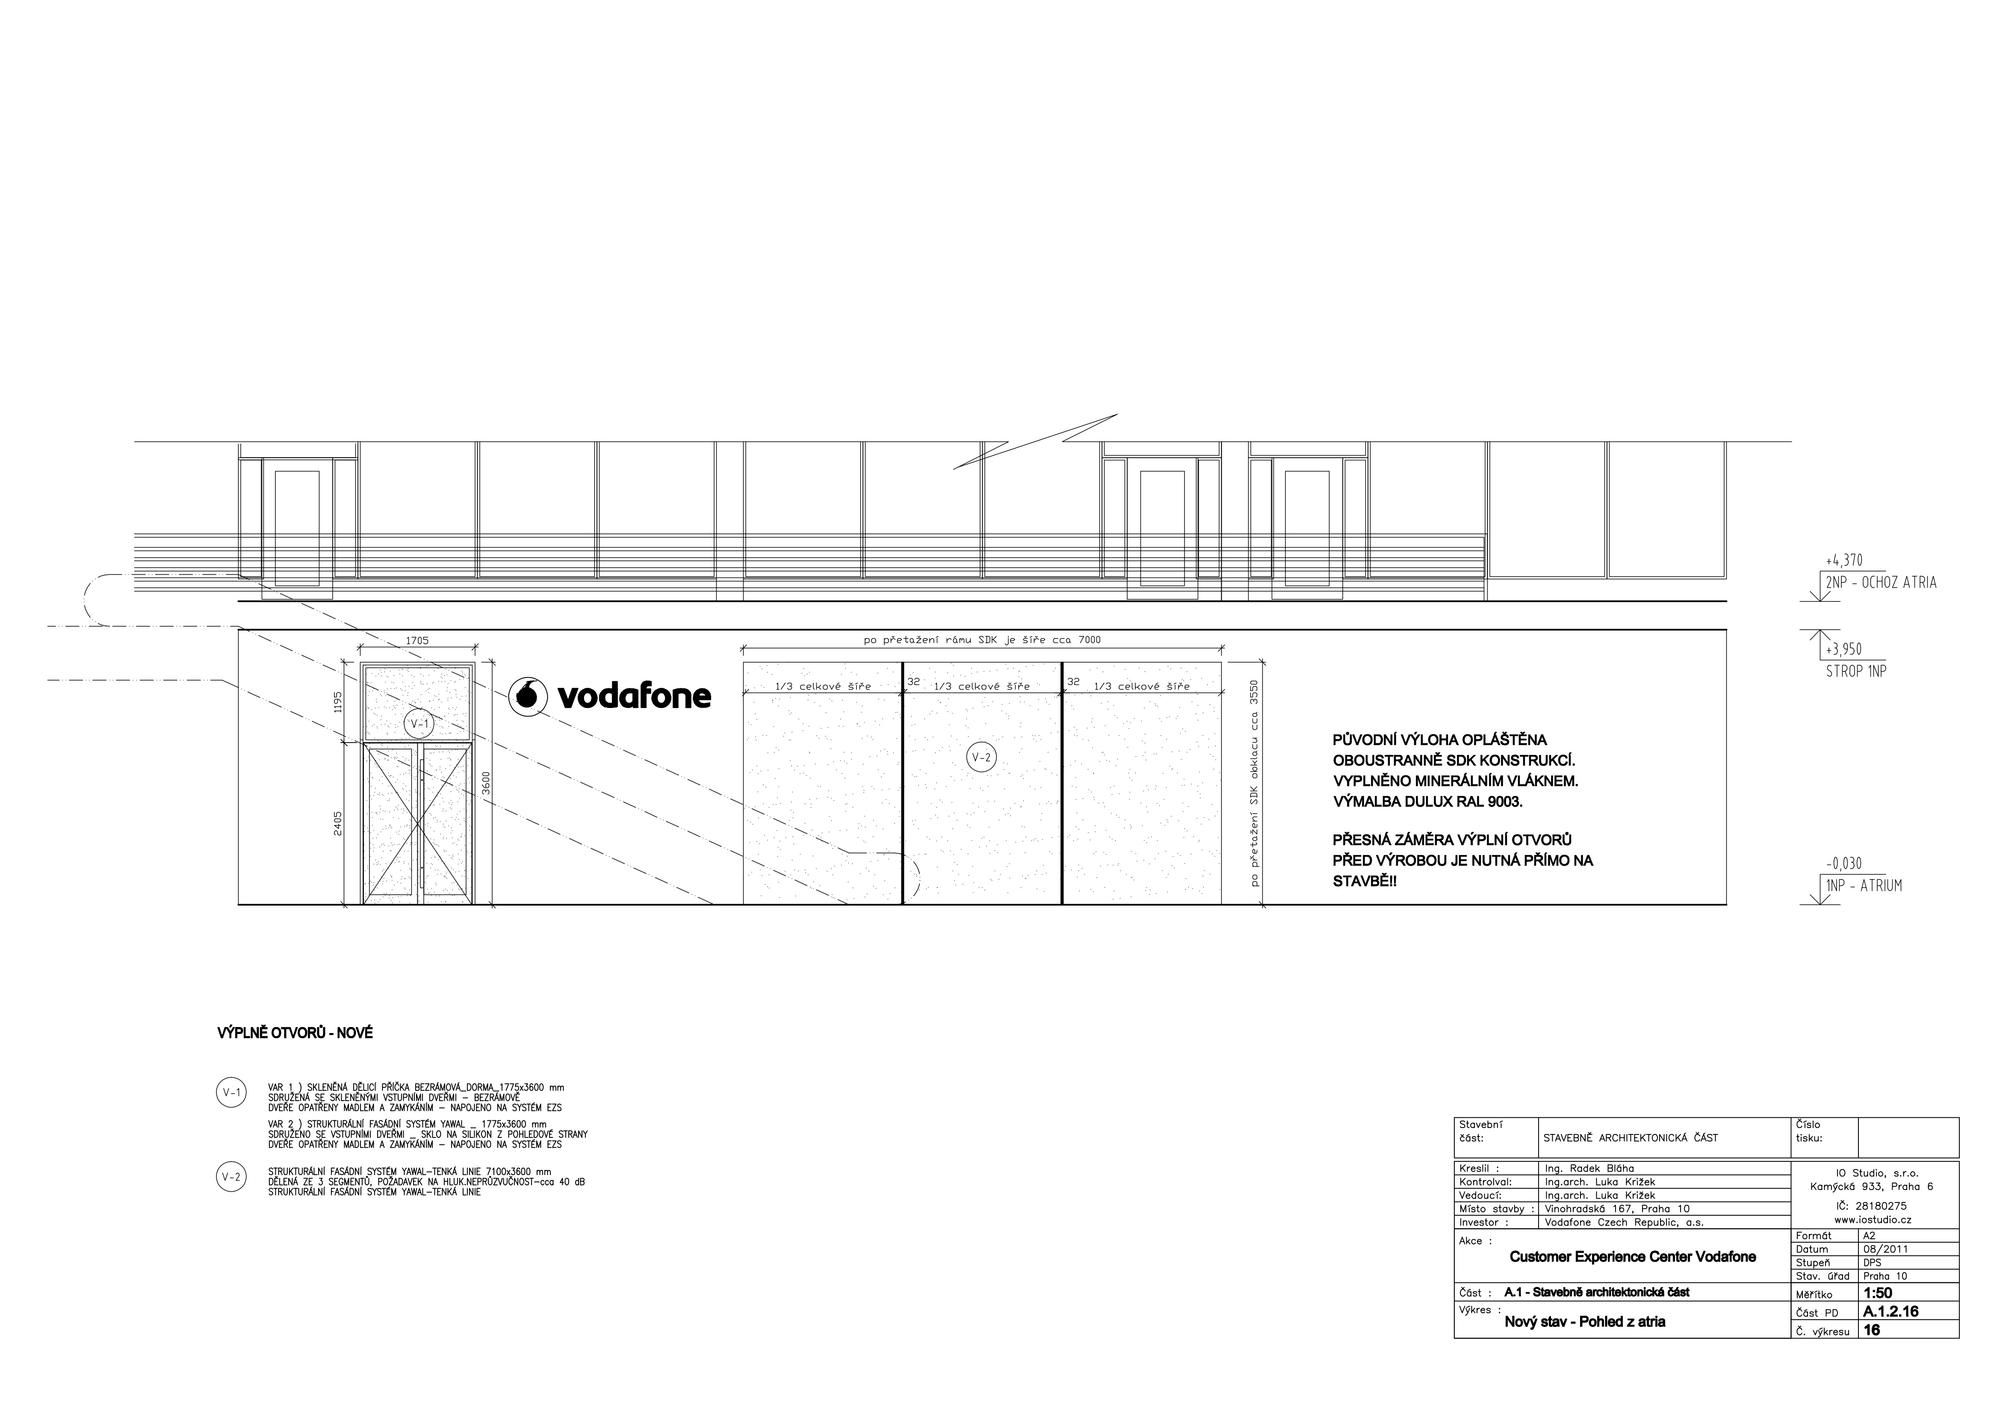 Vodafone Customer Experience Center Interior Design